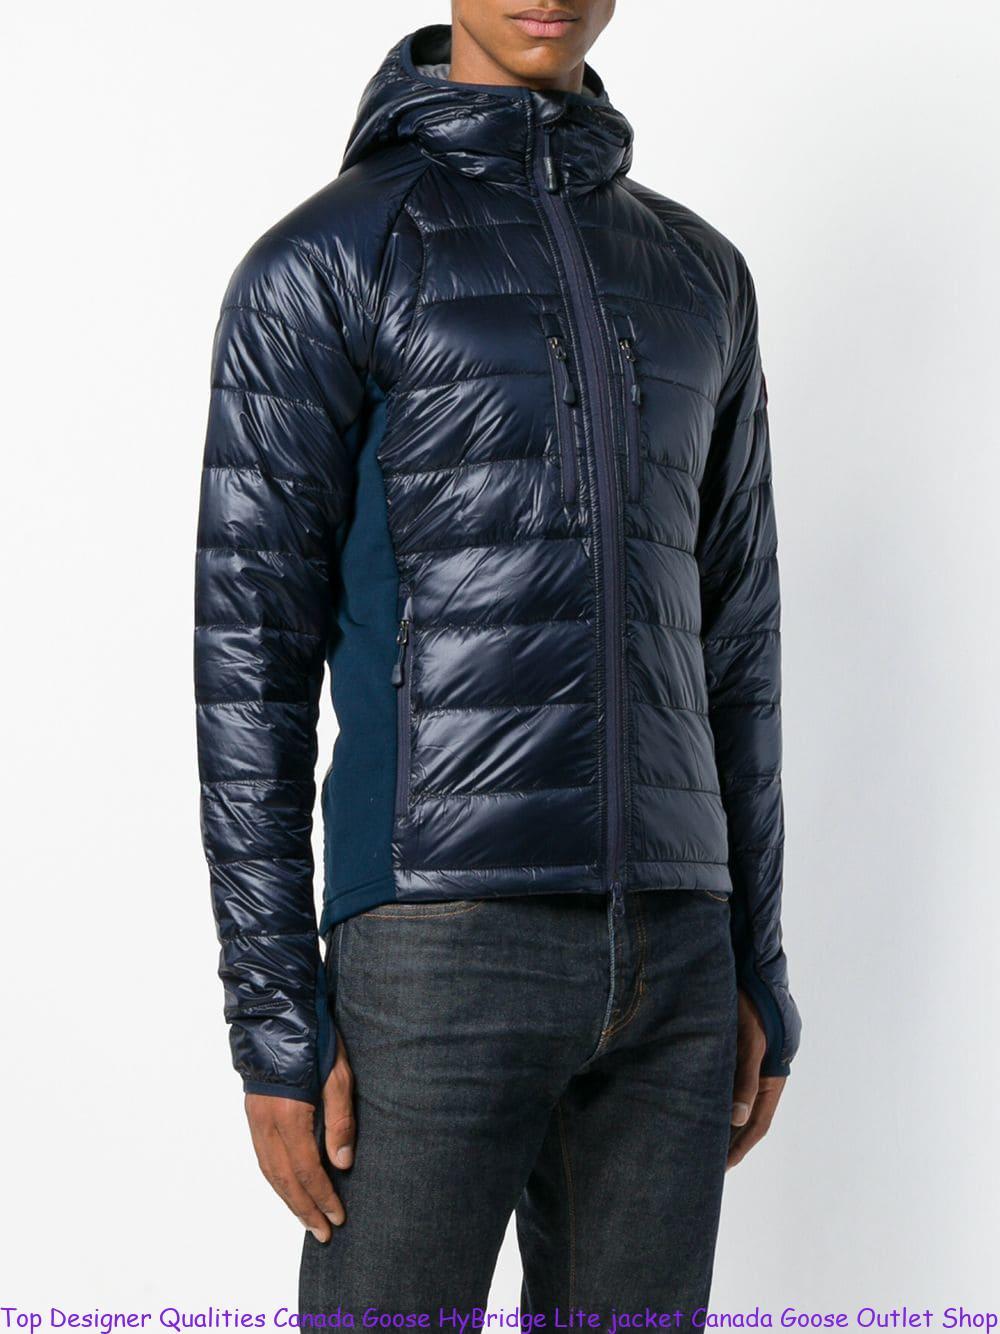 top designer qualities canada goose hybridge lite jacket. Black Bedroom Furniture Sets. Home Design Ideas